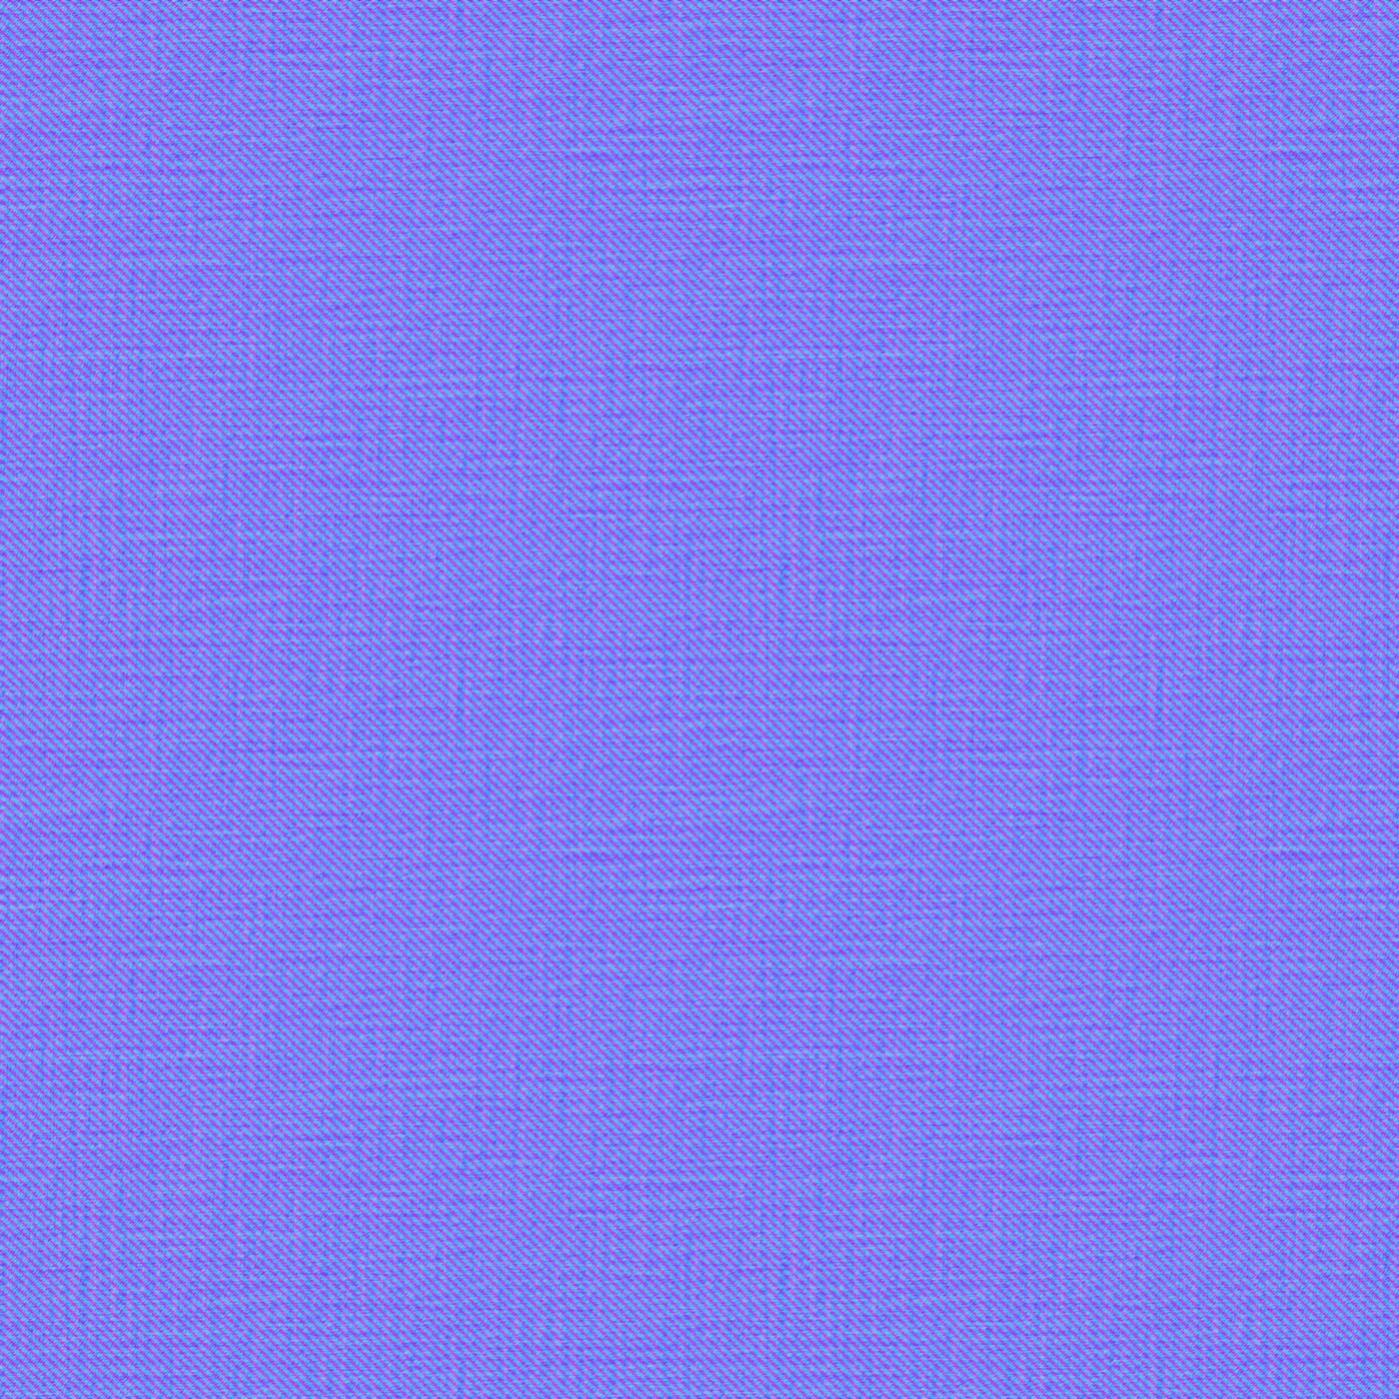 Seamless Grey Fabric Texture Normal Map Texturise Free